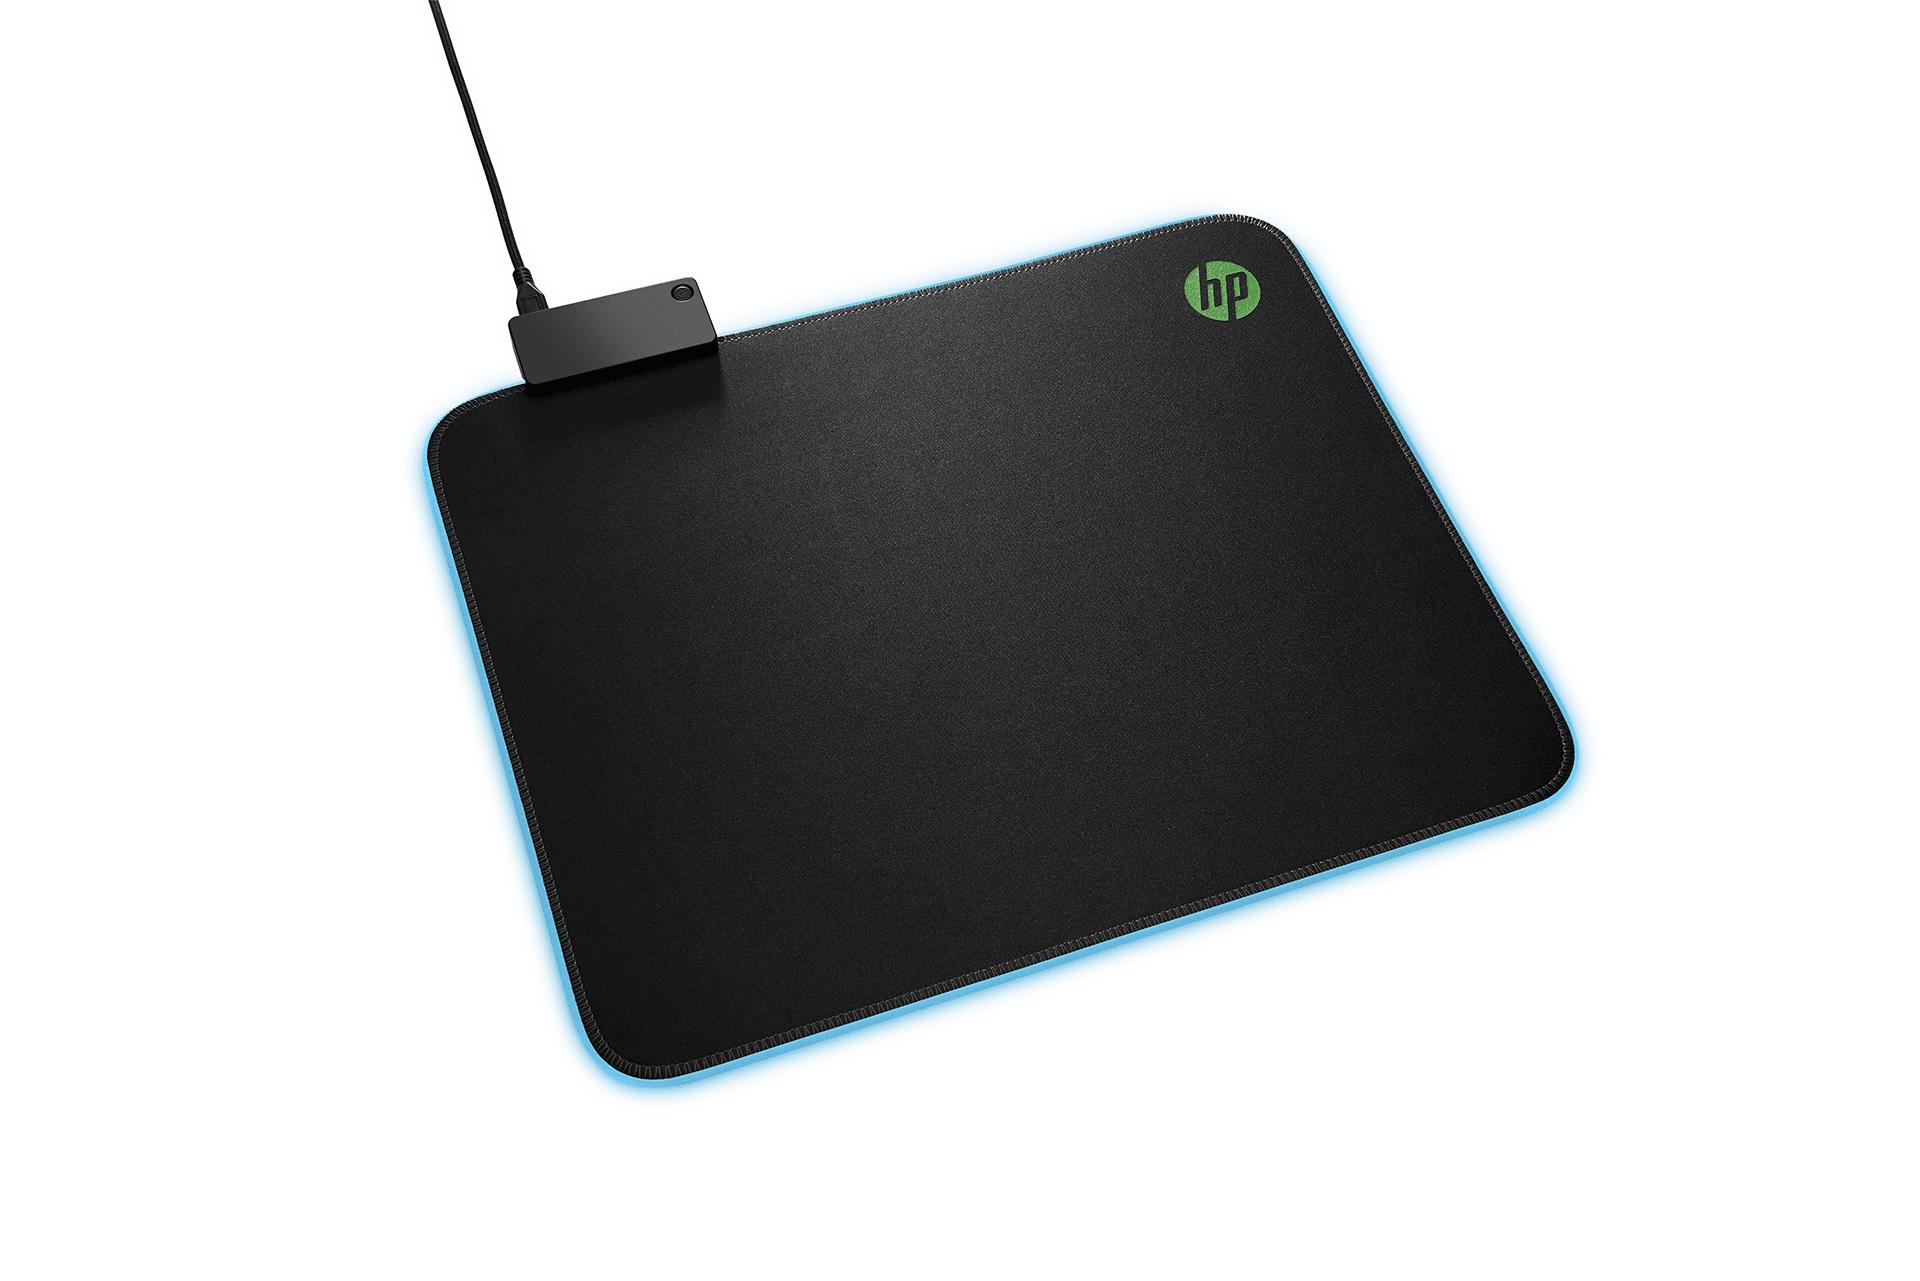 Hp Pavilion Gaming Mousepad 400 2 - Hynerd.it